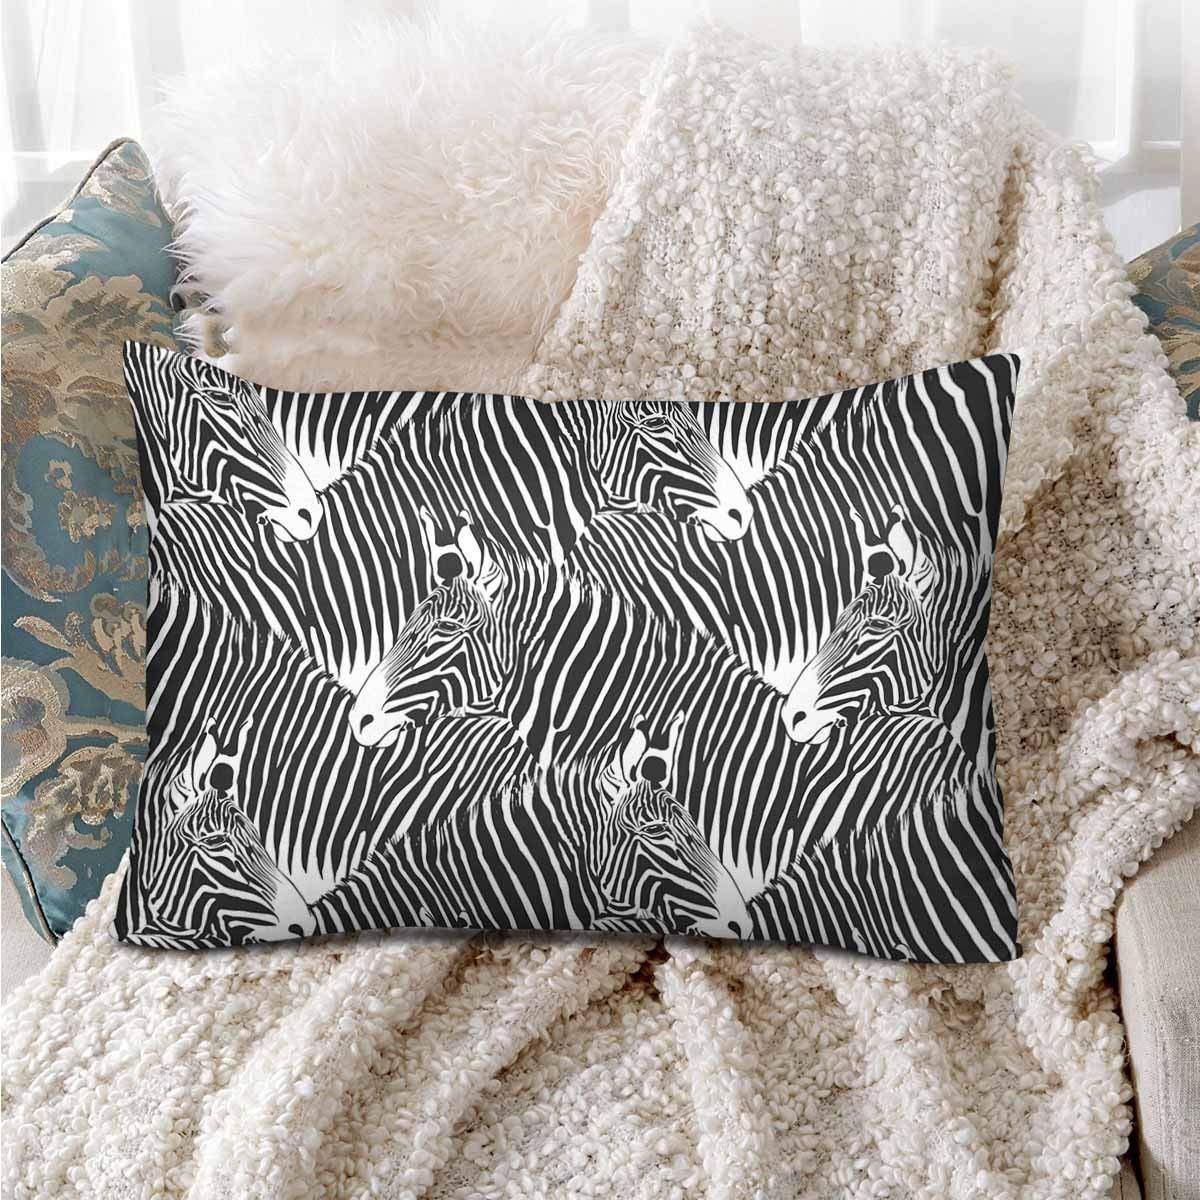 GCKG Zebras Black and White Seamless Pattern Pillow Cases Pillowcase 20x30 inches - image 2 de 4